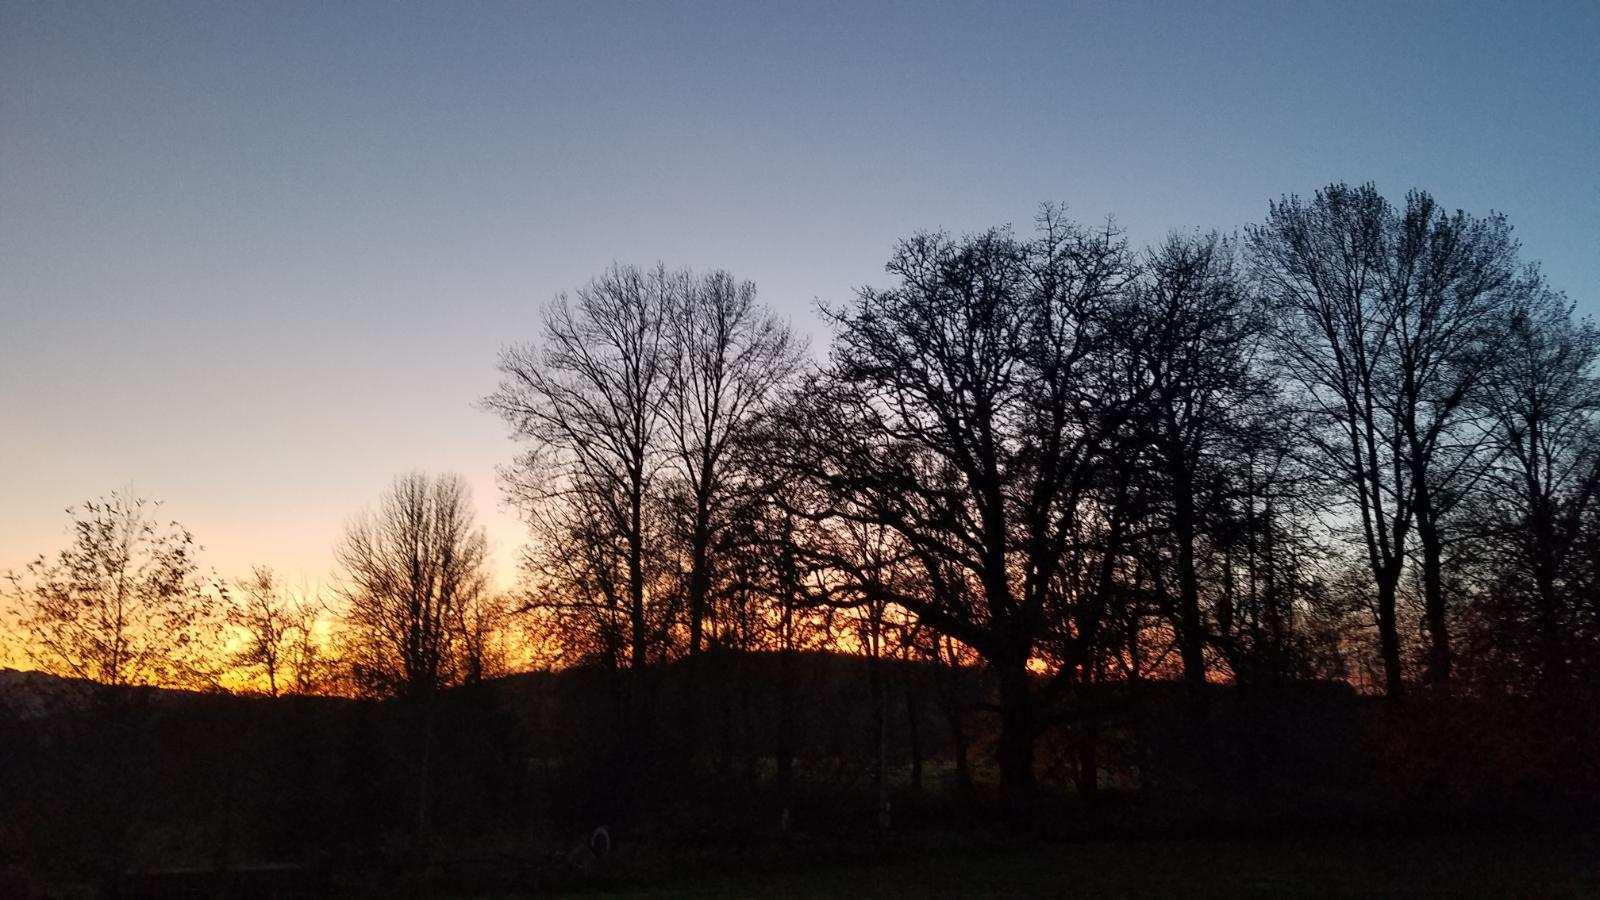 October dusk